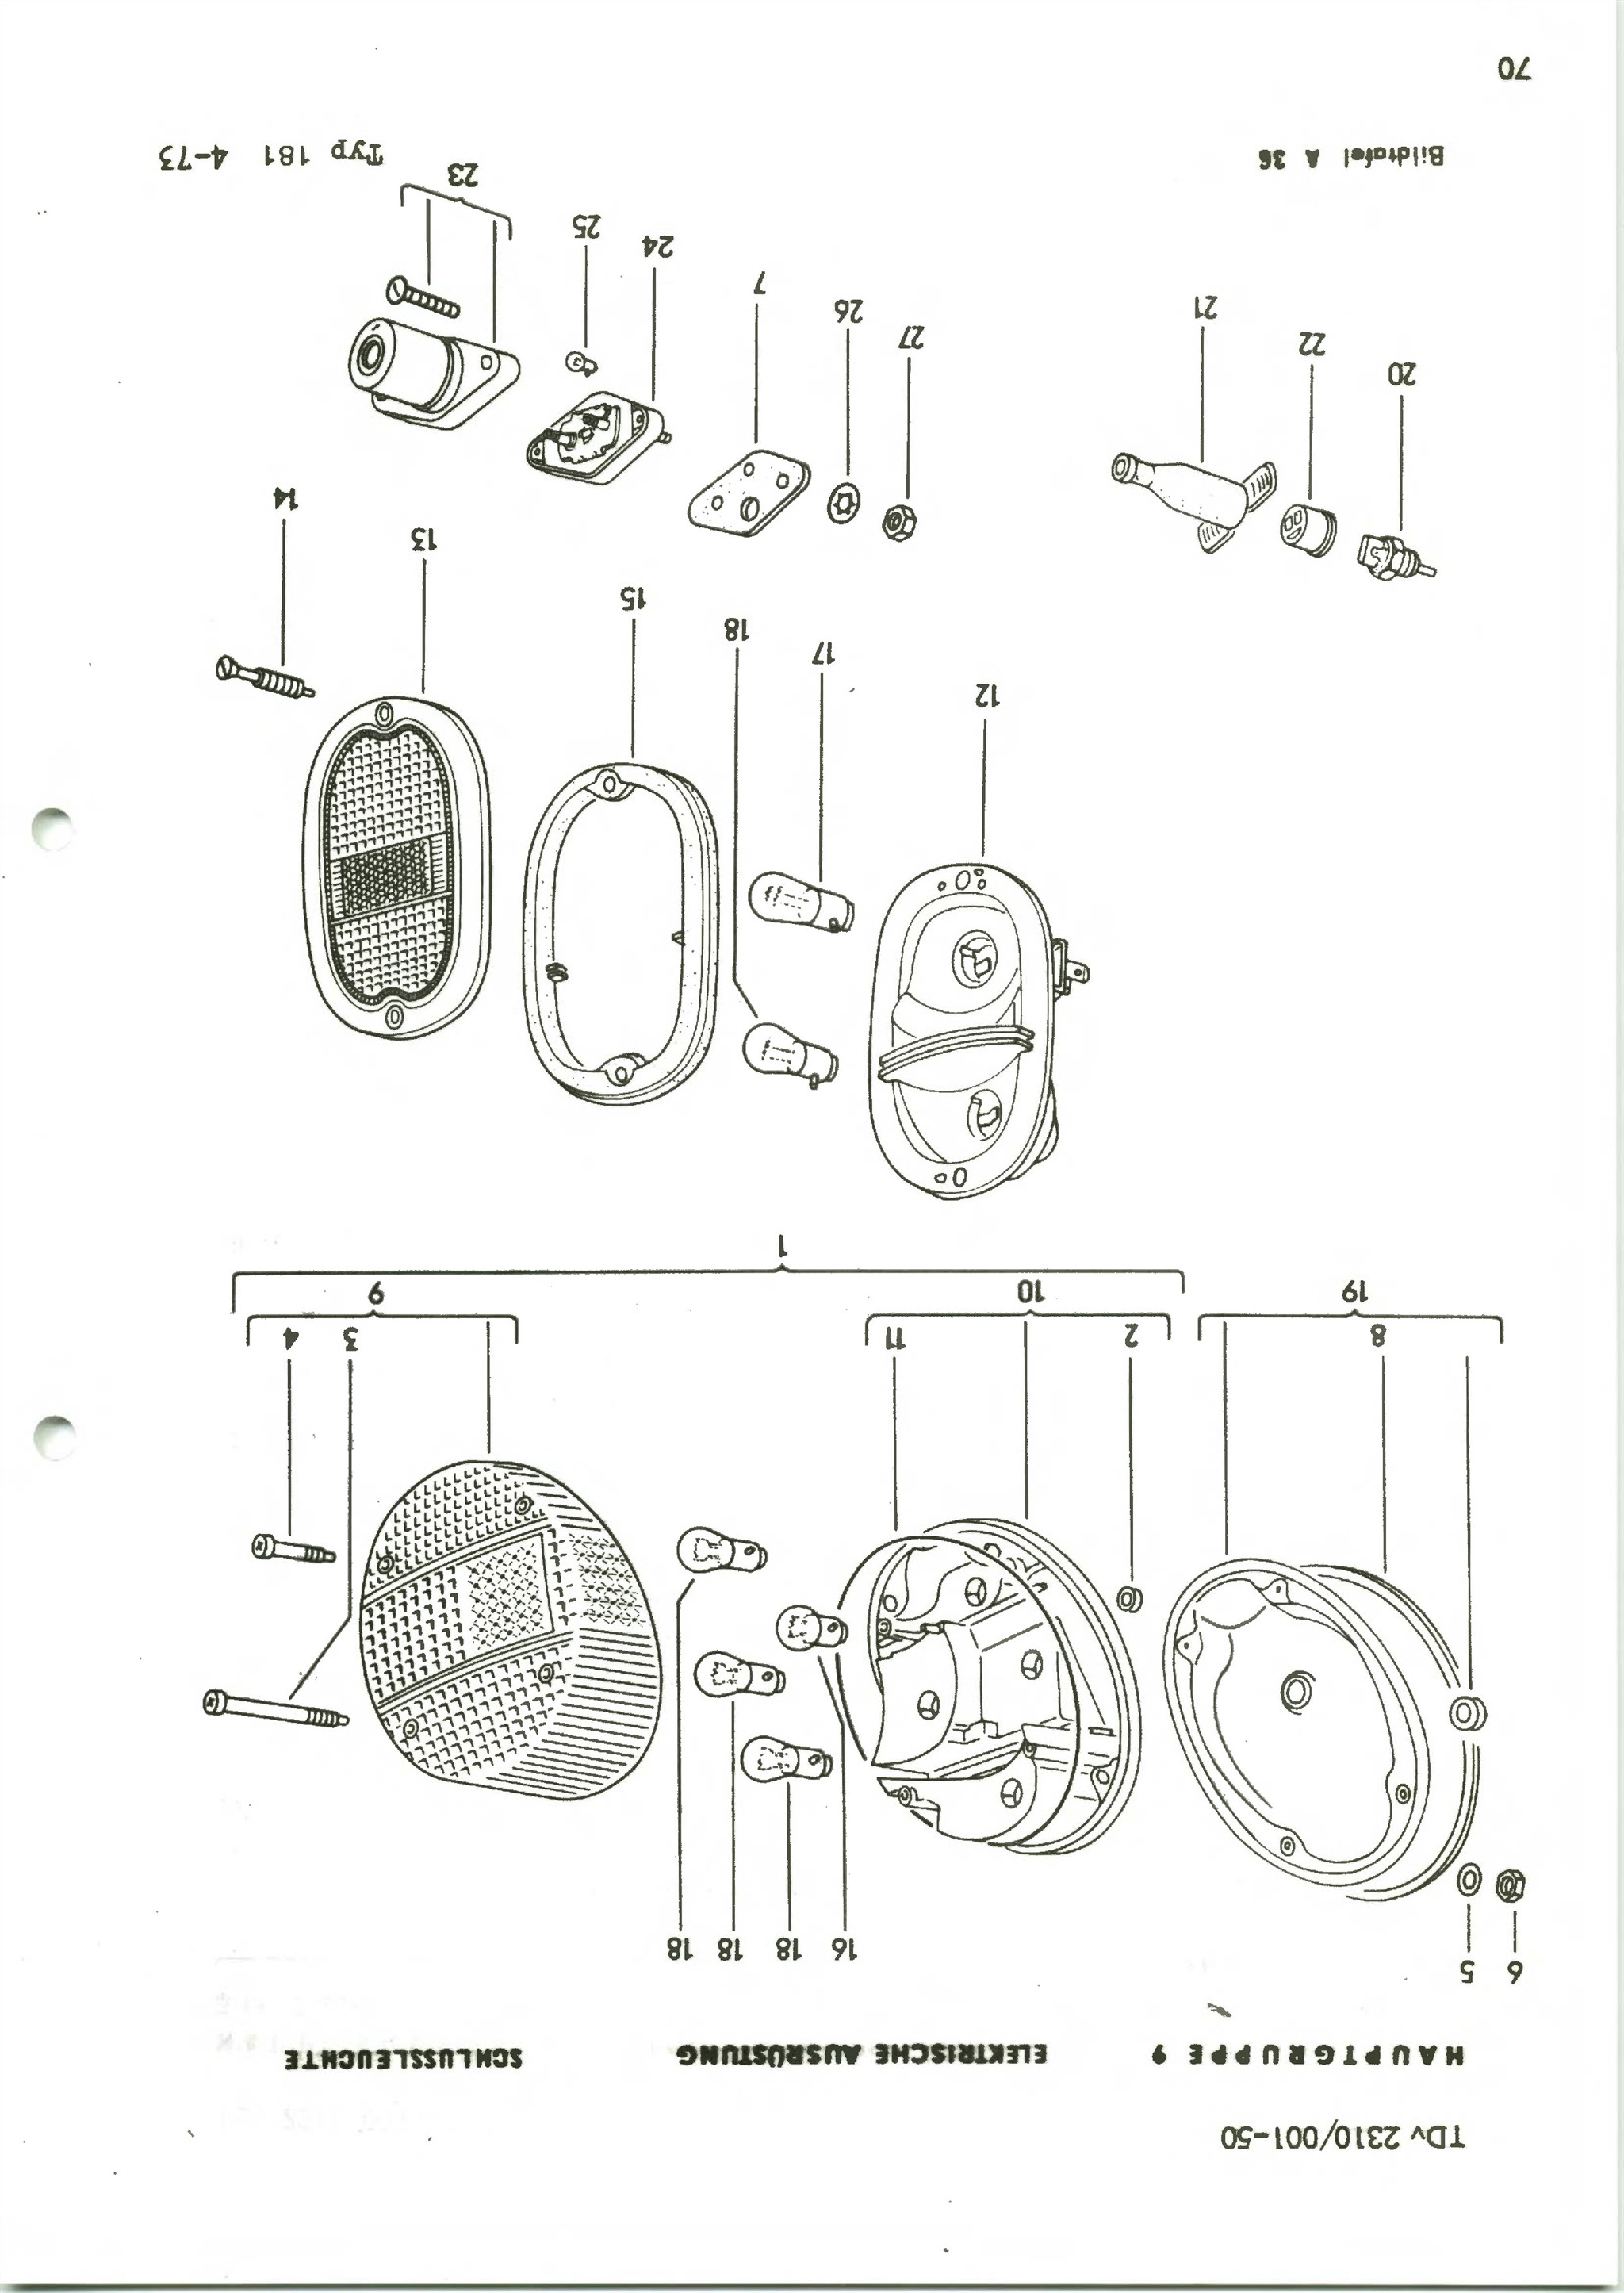 cucv m1009 wiring diagram pt cruiser 2002 m1008 imageresizertool com